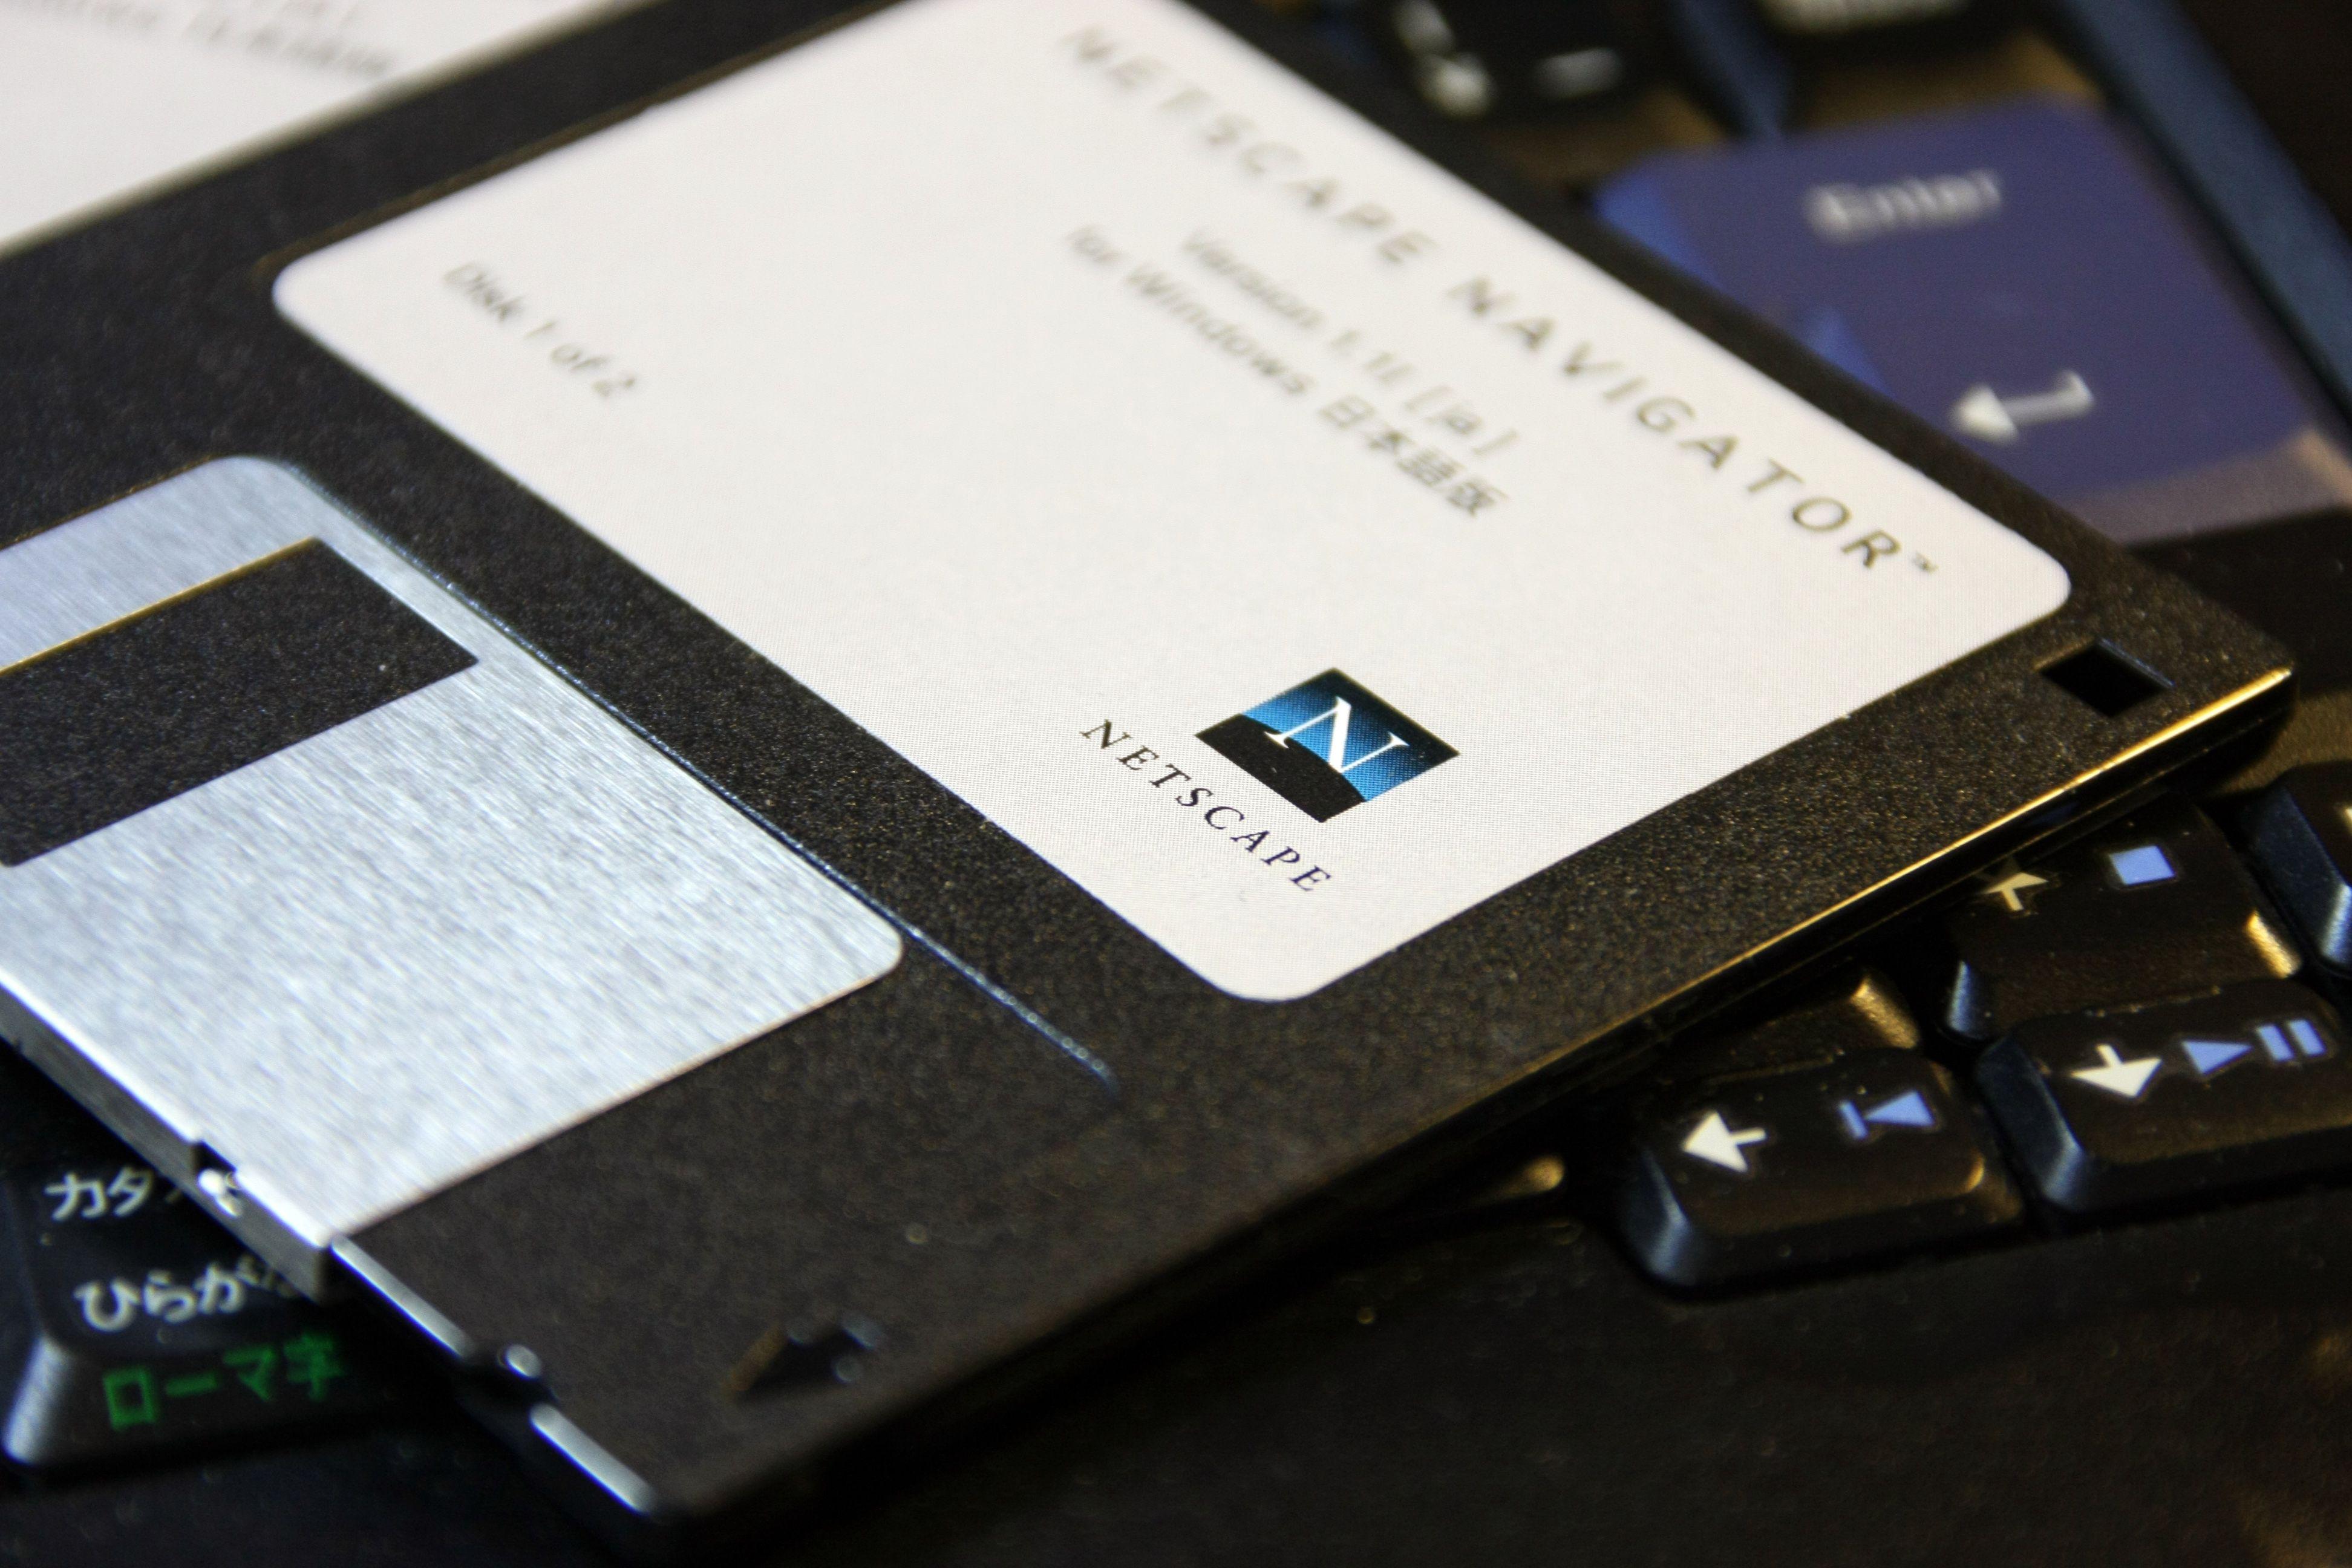 Netscape Navigator Version 1.11, 1995